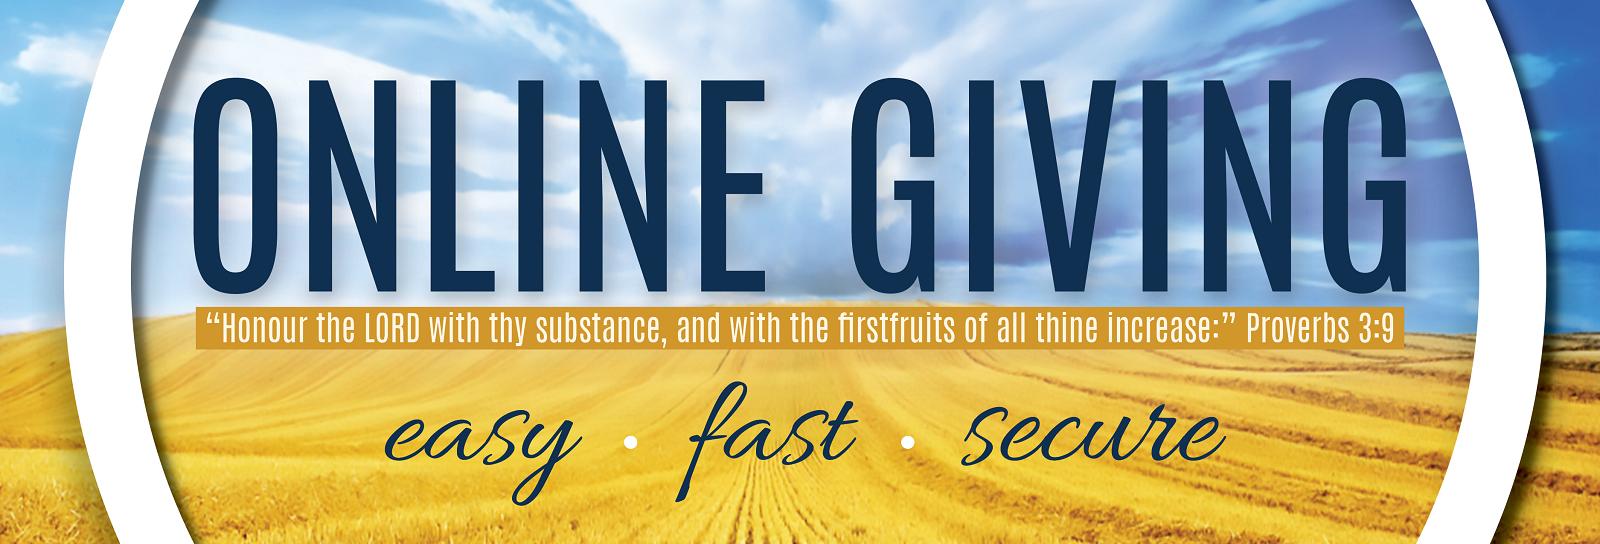 online giving1